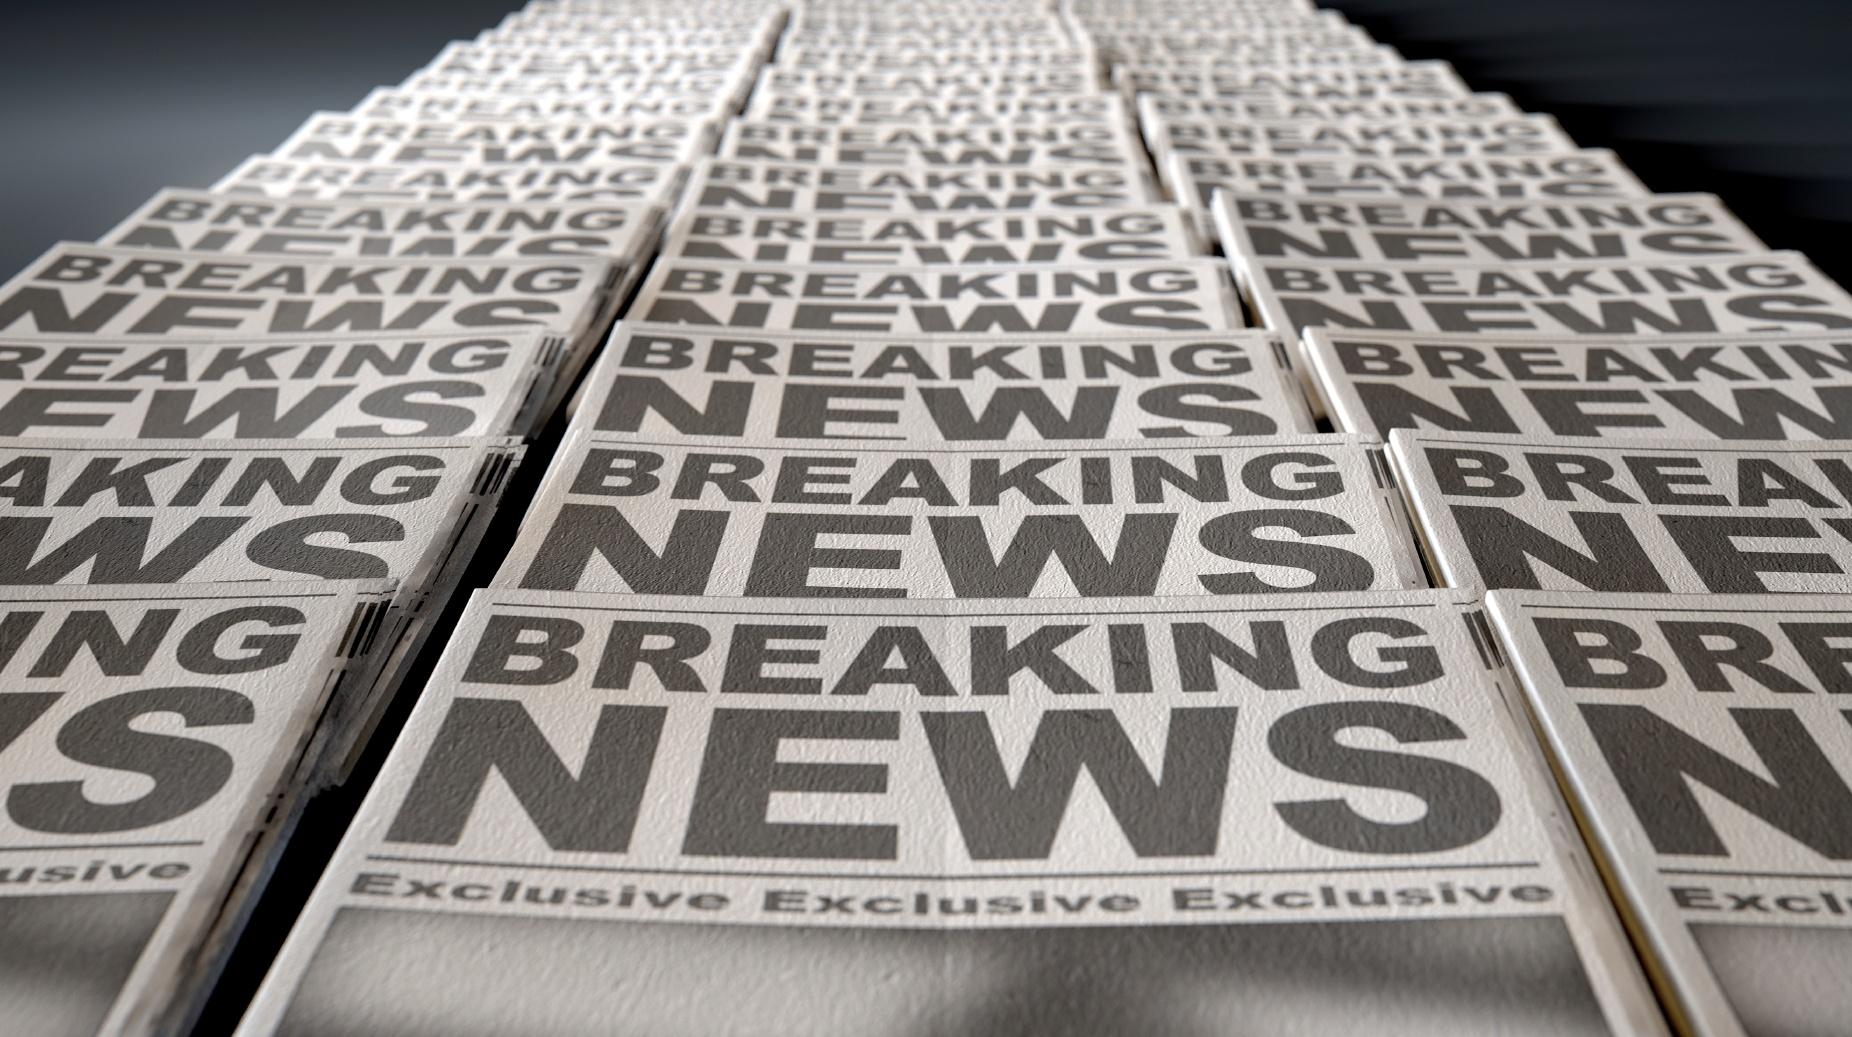 Breaking-News-Rovema-Coronavirus-Protocol-Announced